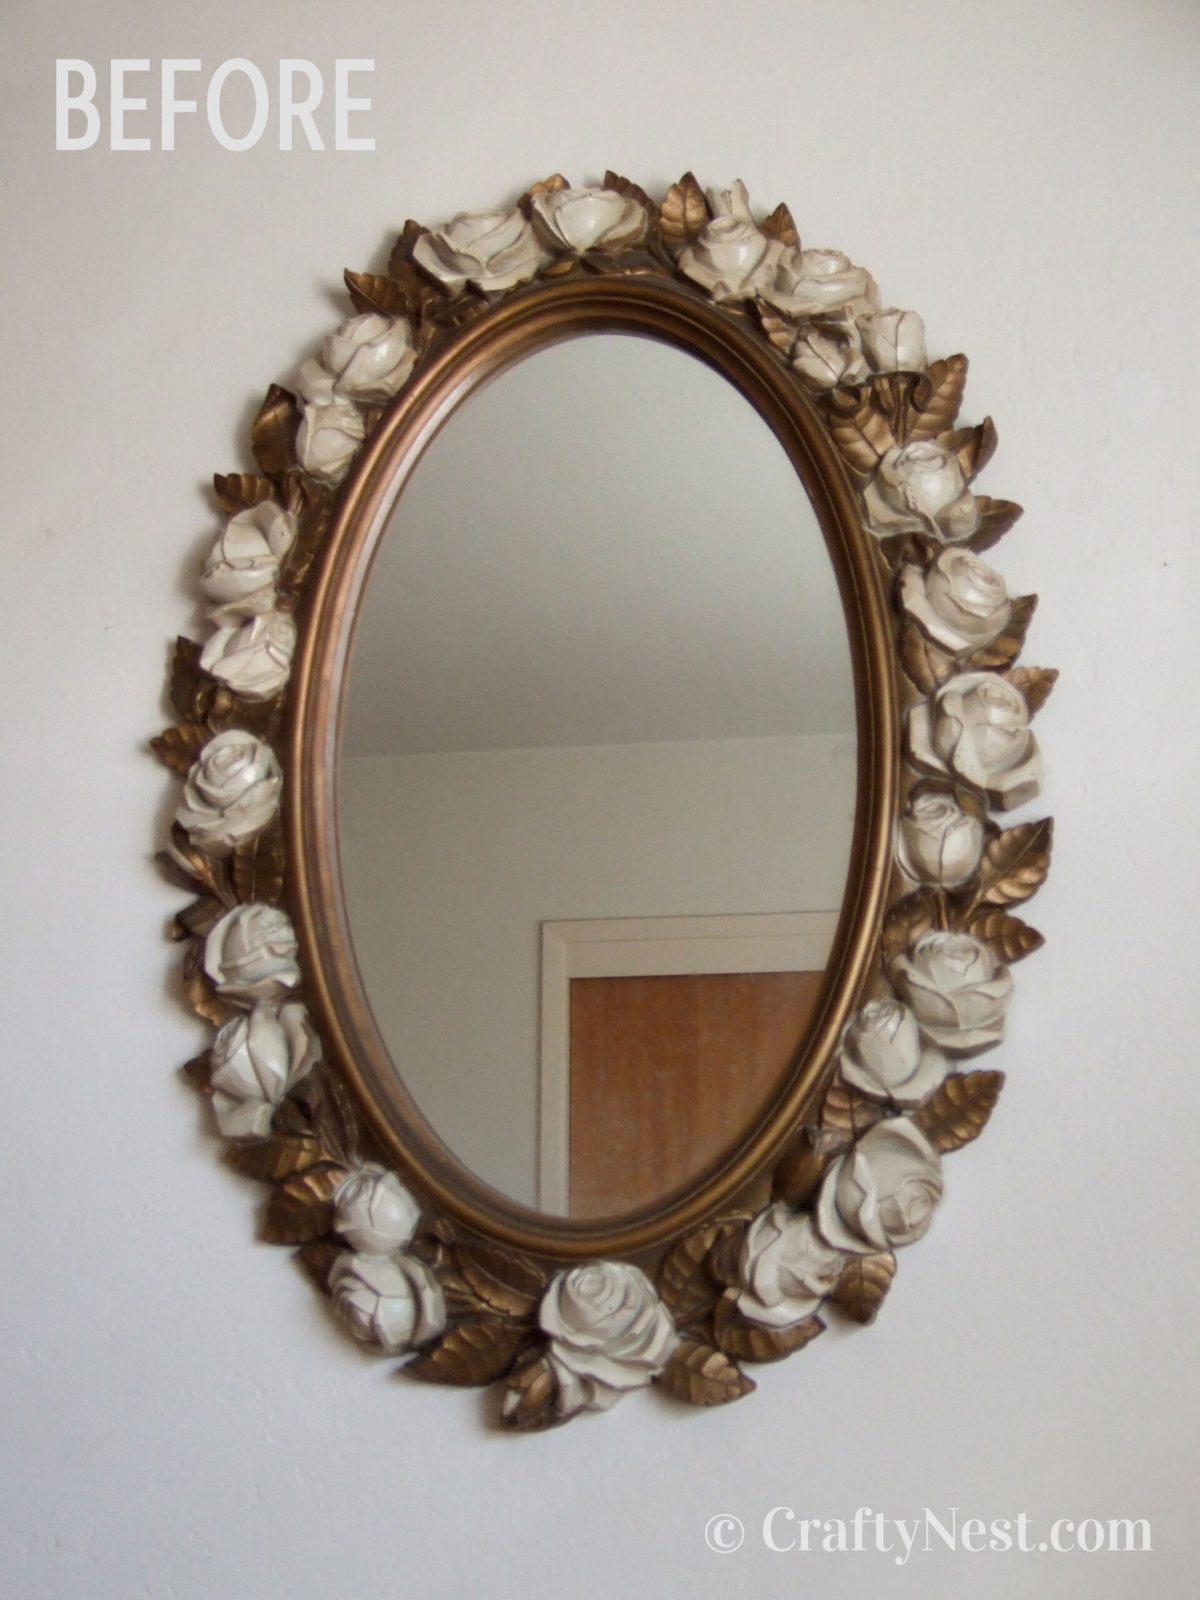 The thrift store plastic mirror, photo